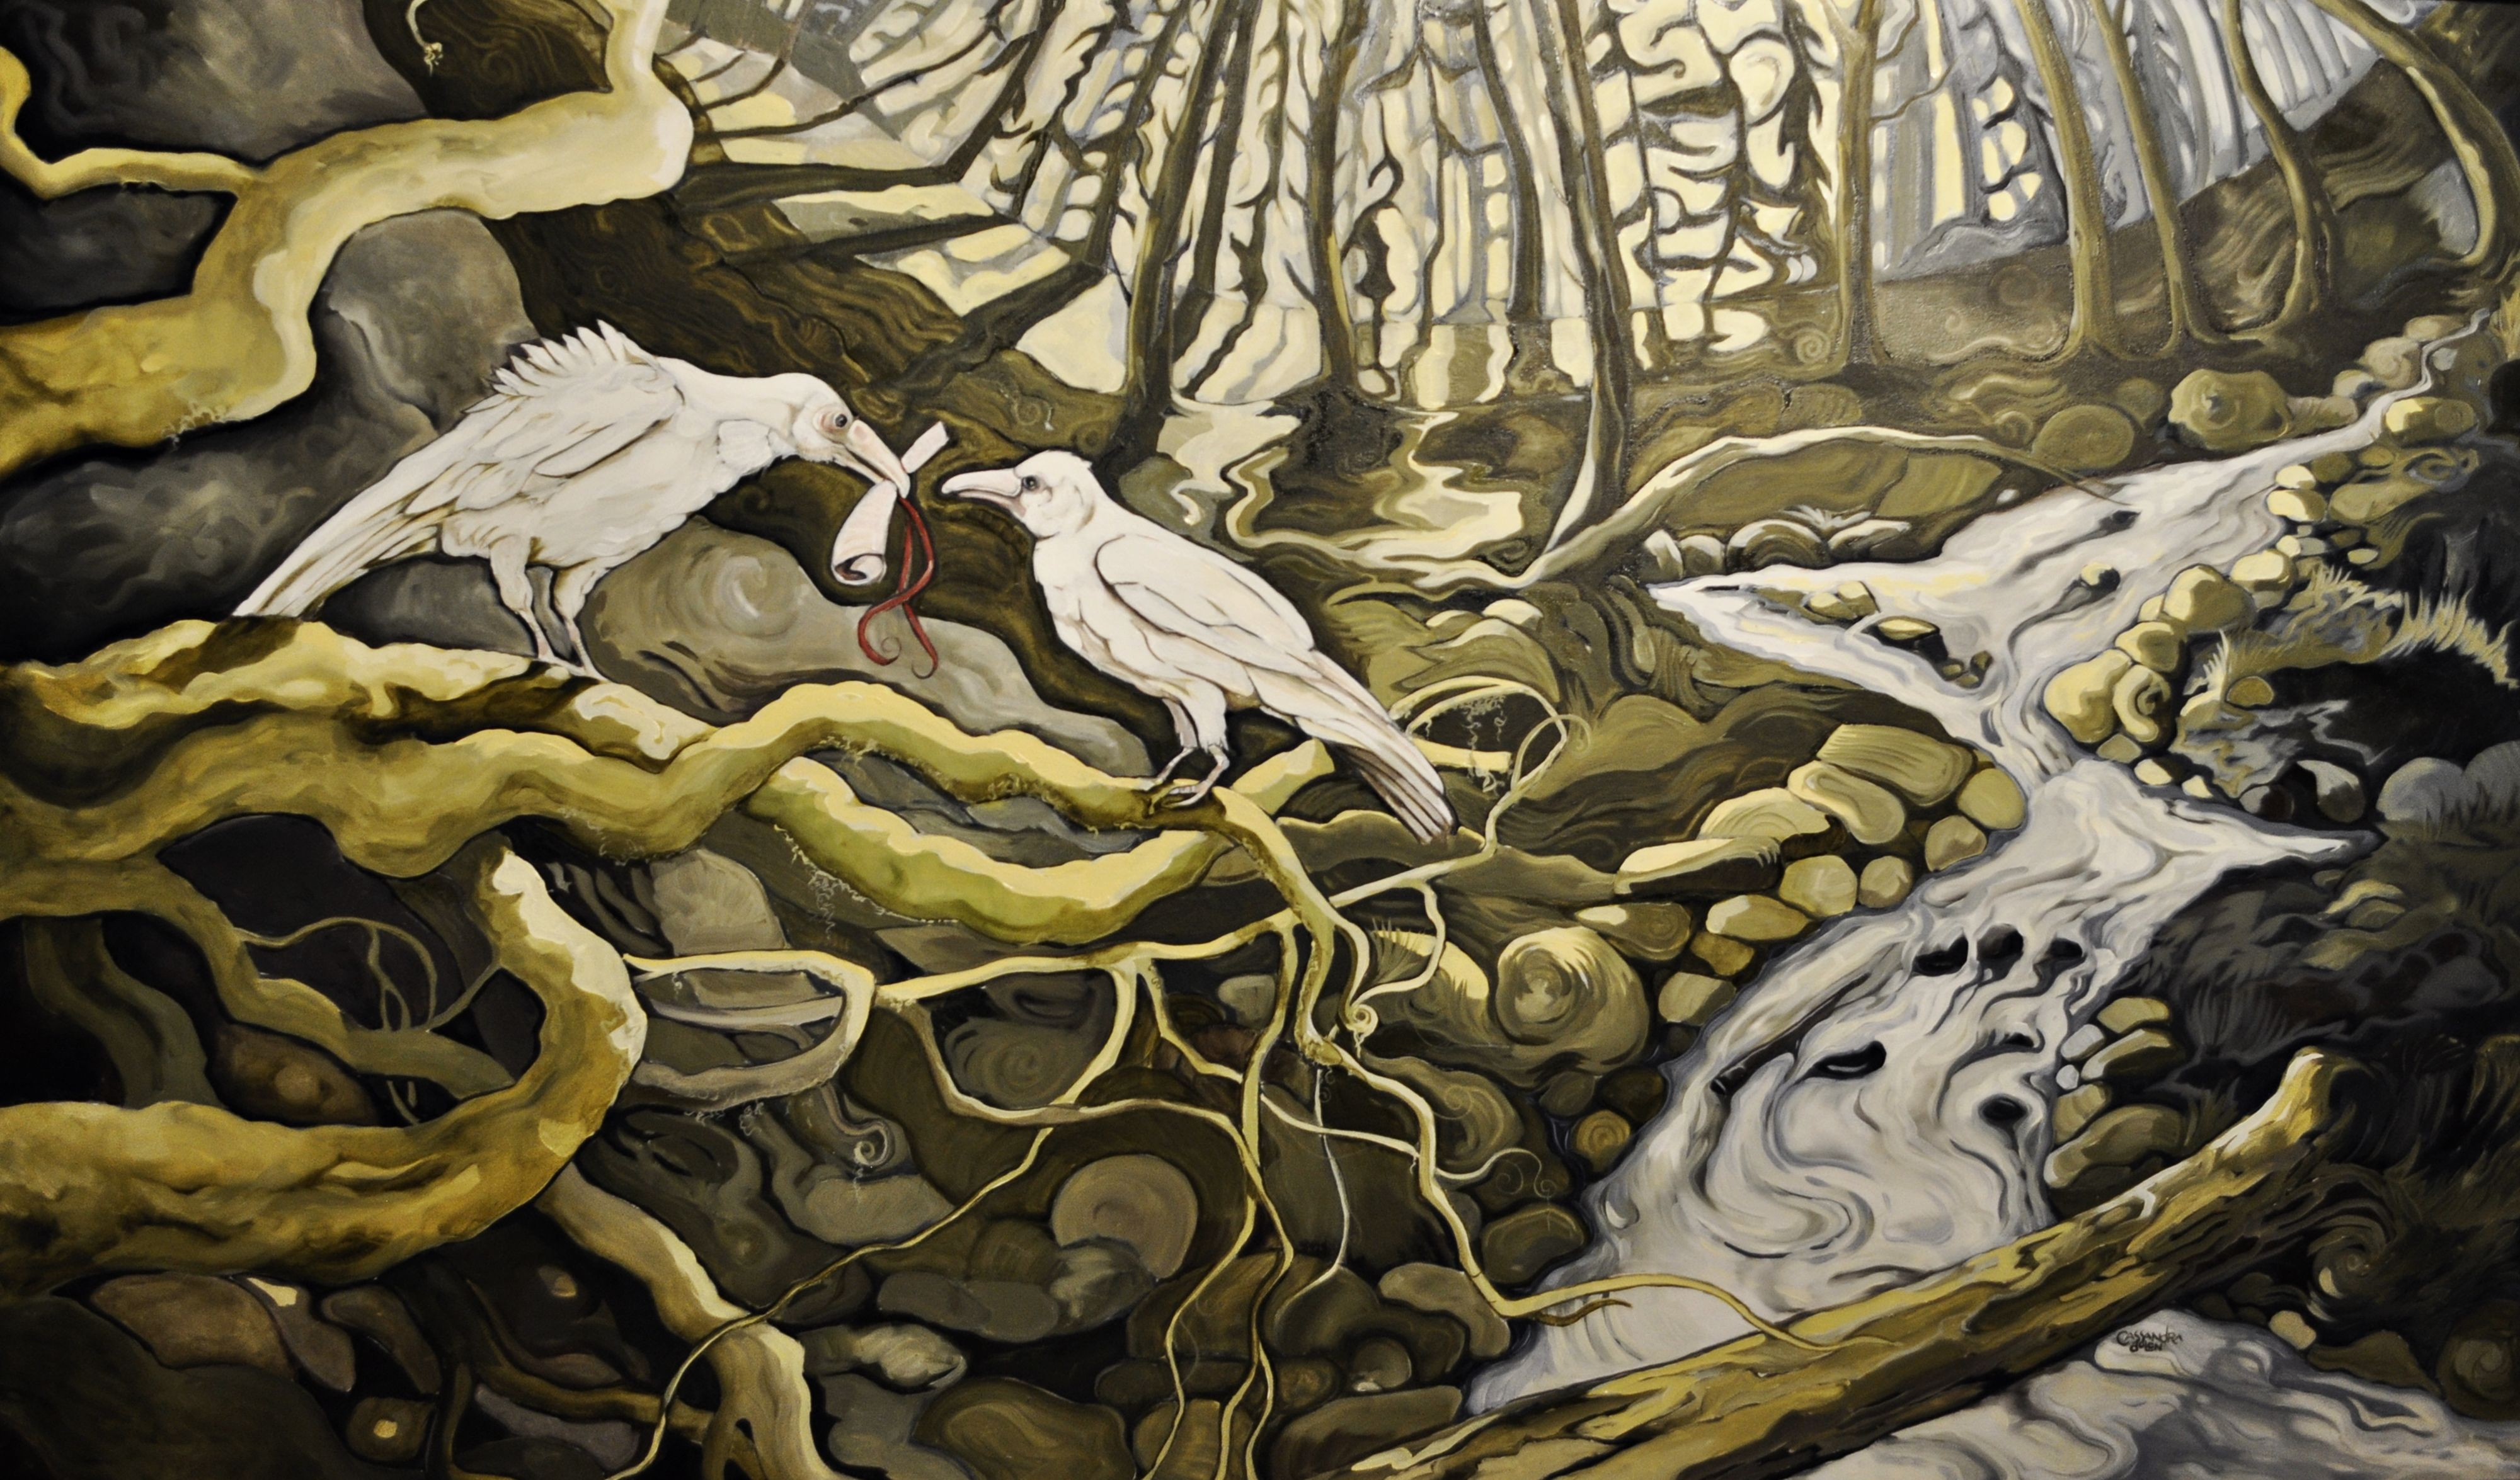 The Message         Cassandra Dolen       walnut oil   5' x 2.5'   White ravens of Qualicum, B.C  thanks to Mike Yip for the use of his photos of white ravens https://www.facebook.com/Cassandradolen.ca?ref=tn_tnmn #bcart #cassandradolen #canadianart #ravens